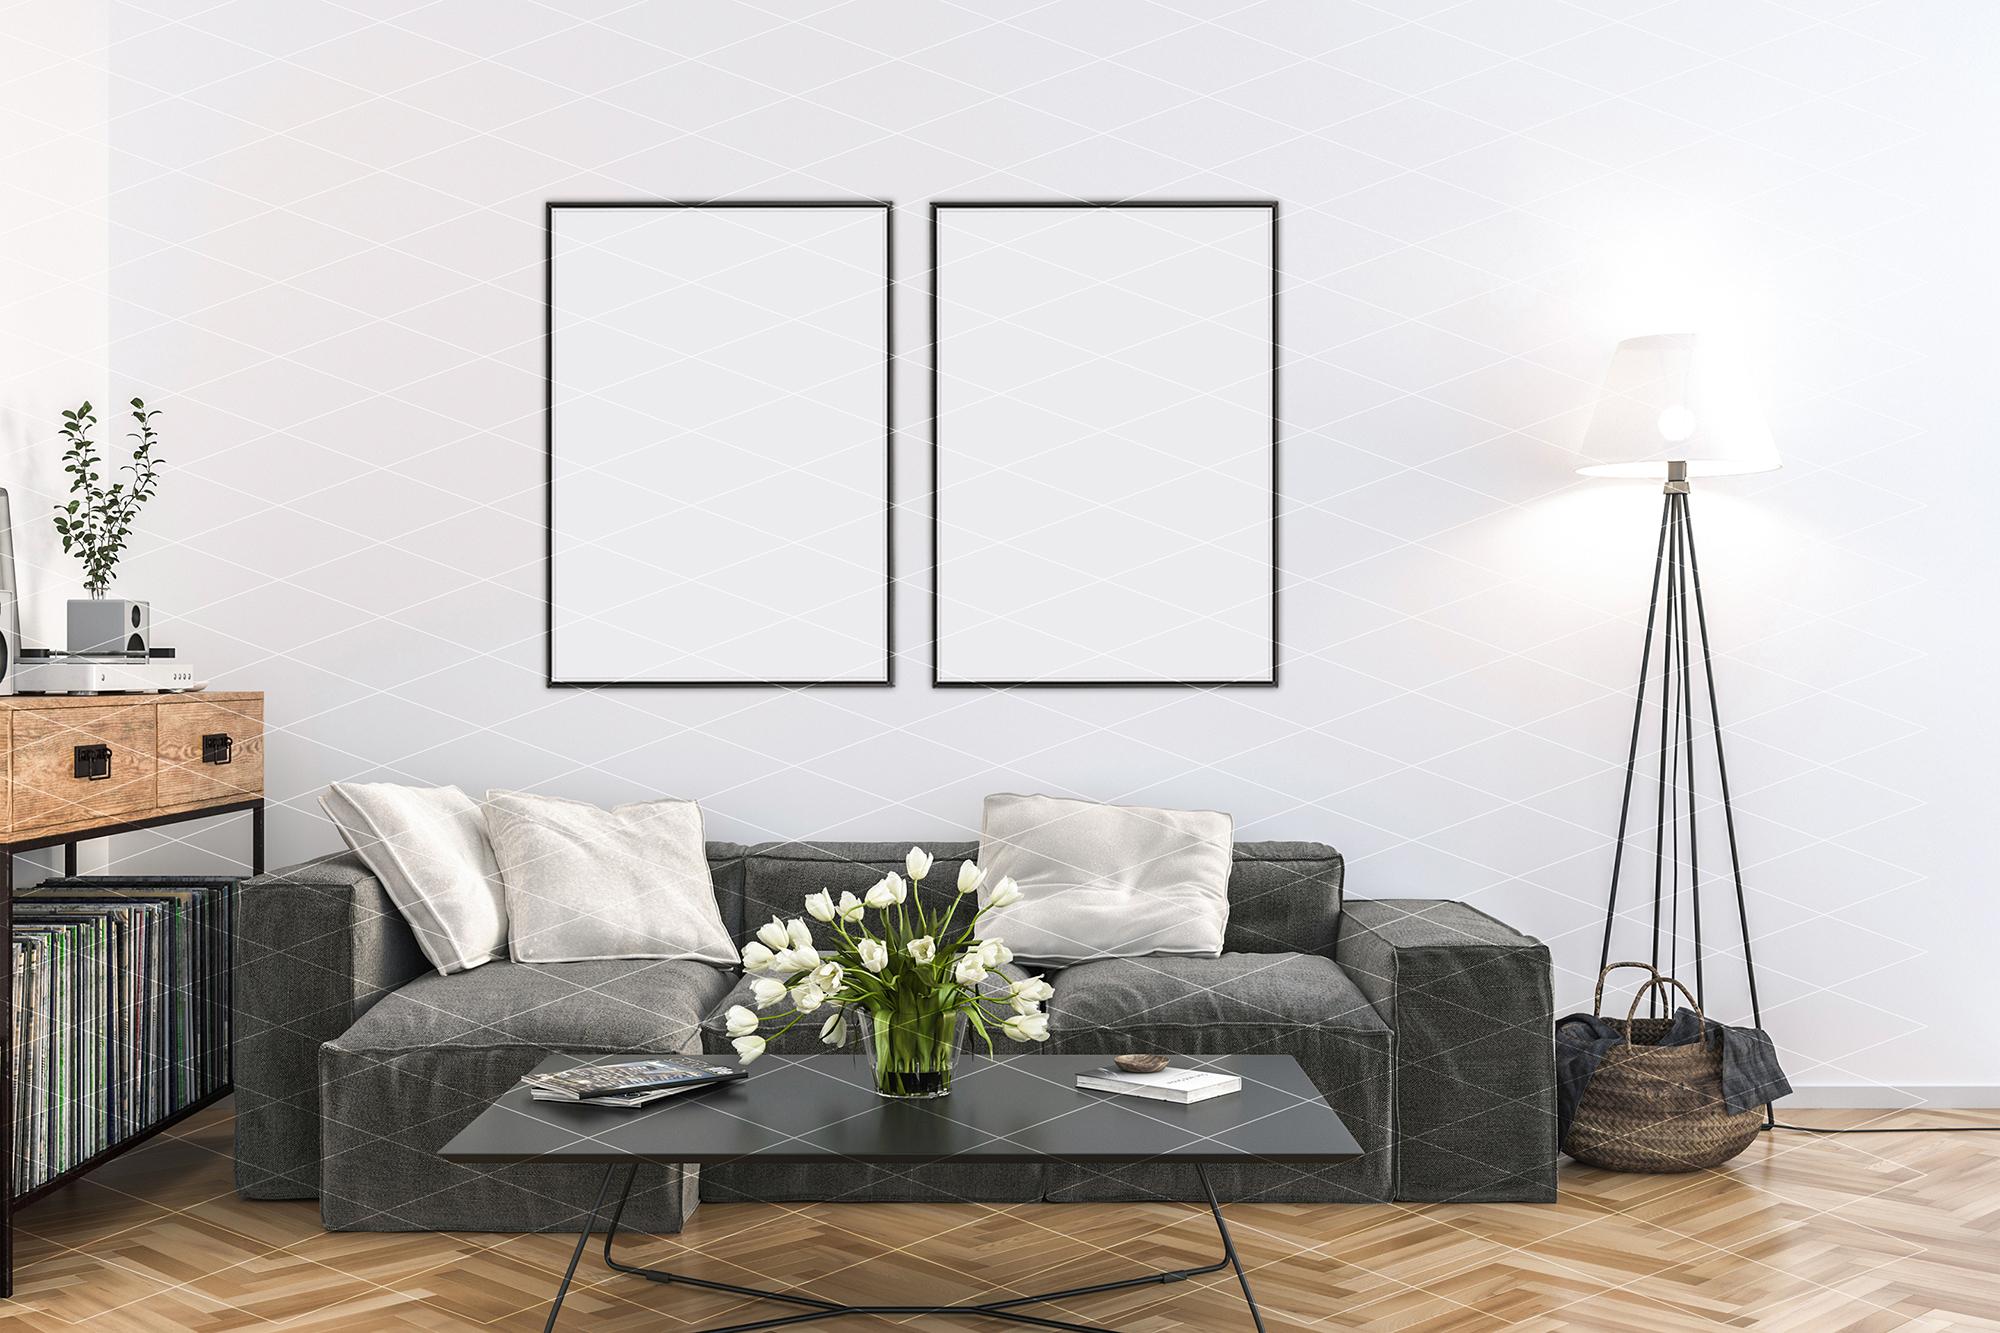 Interior mockup - artwork background - kitchen example image 2